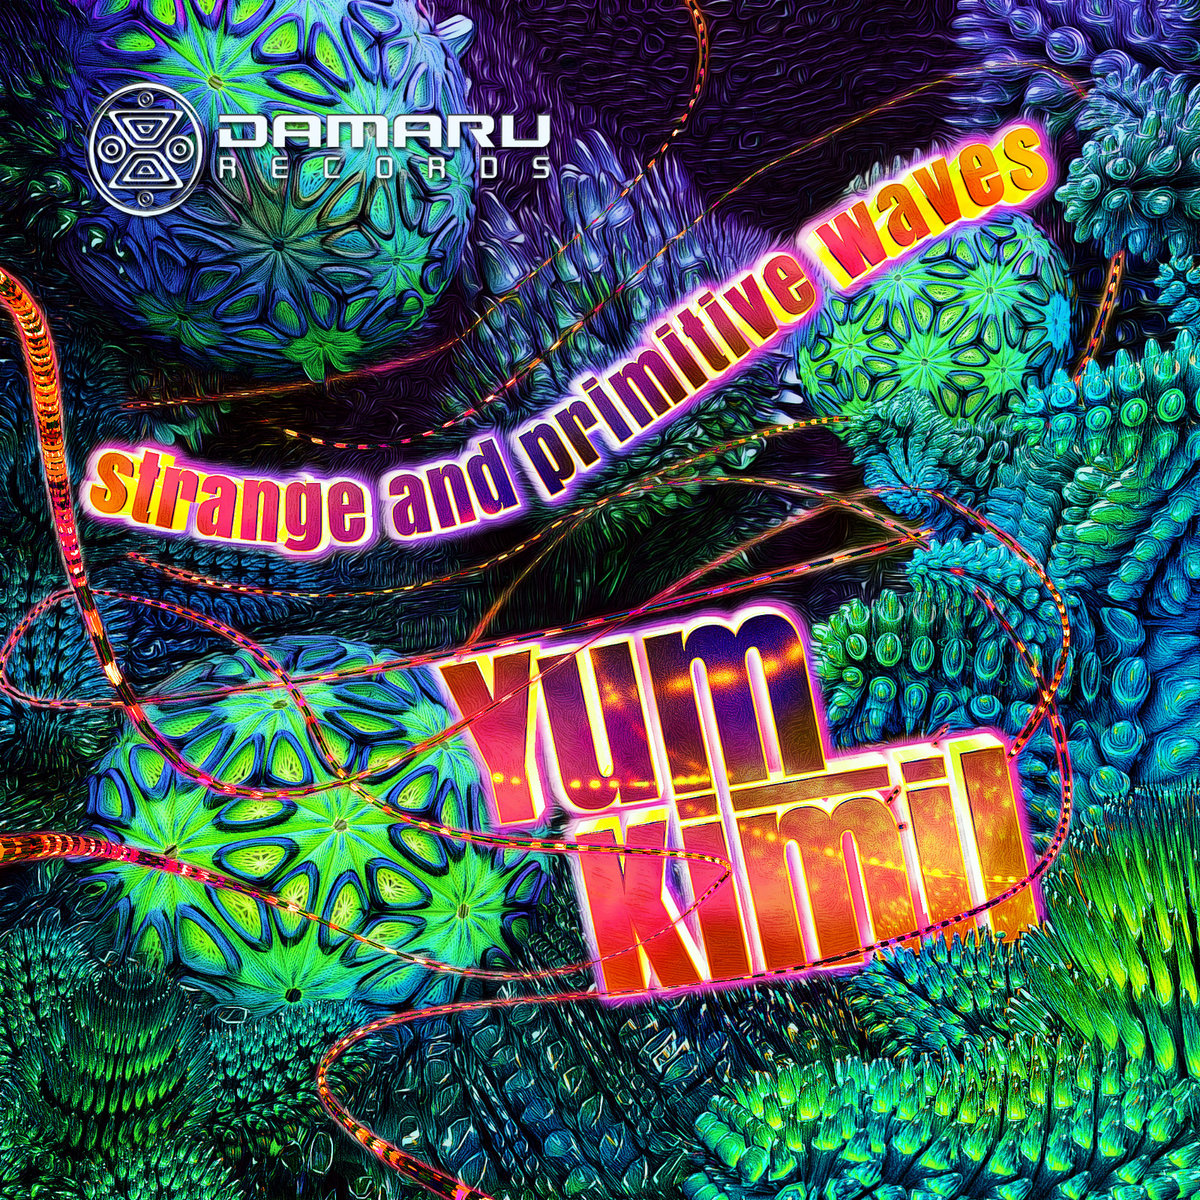 Yum Kimil - Strange and Primitive Waves   Damaru Records